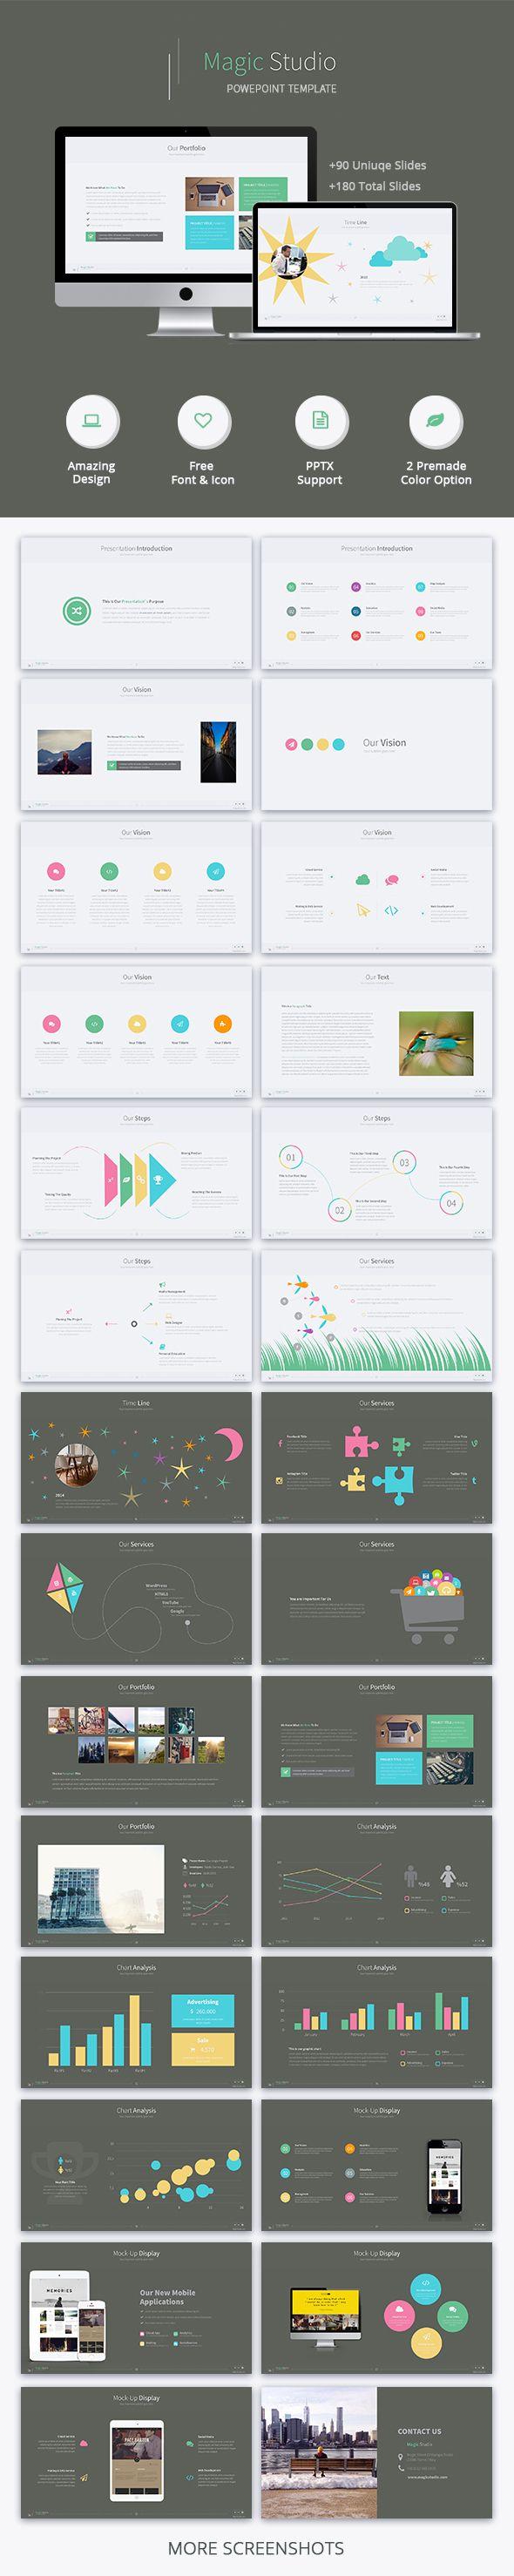 Magic Studio - Creative Powerpoint Template #design #slides Download: http://graphicriver.net/item/magic-studio-creative-powerpoint-template/13643384?ref=ksioks